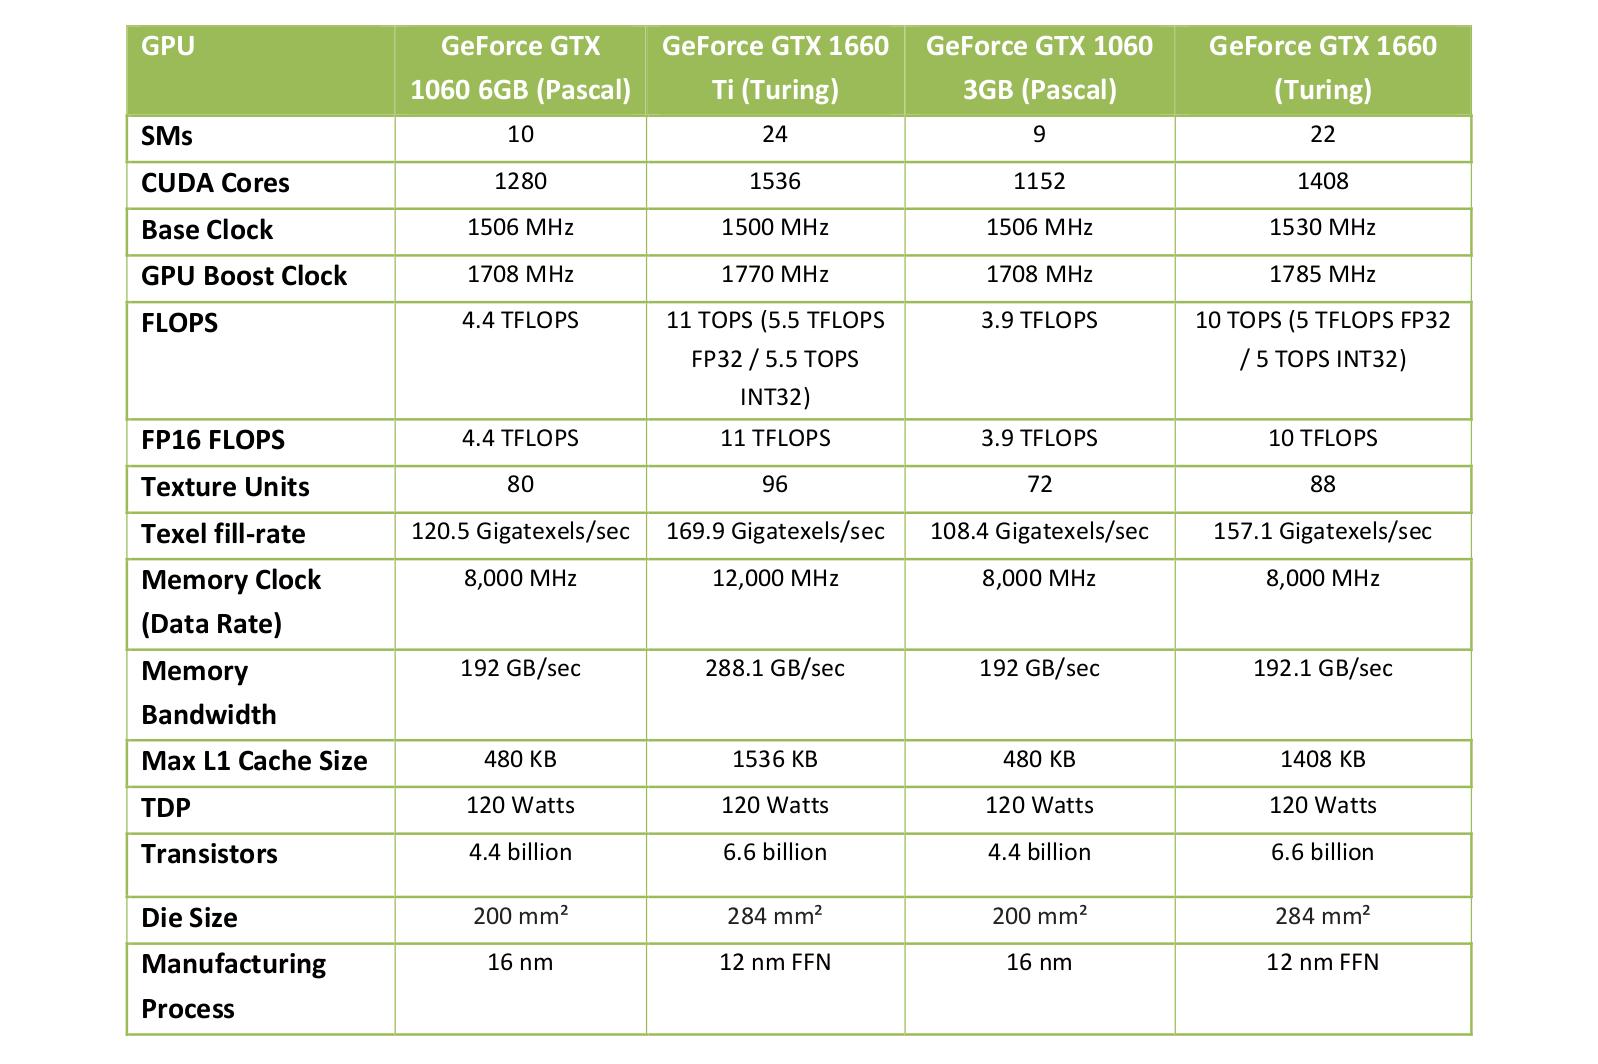 GeForce GTX 1660 Specs